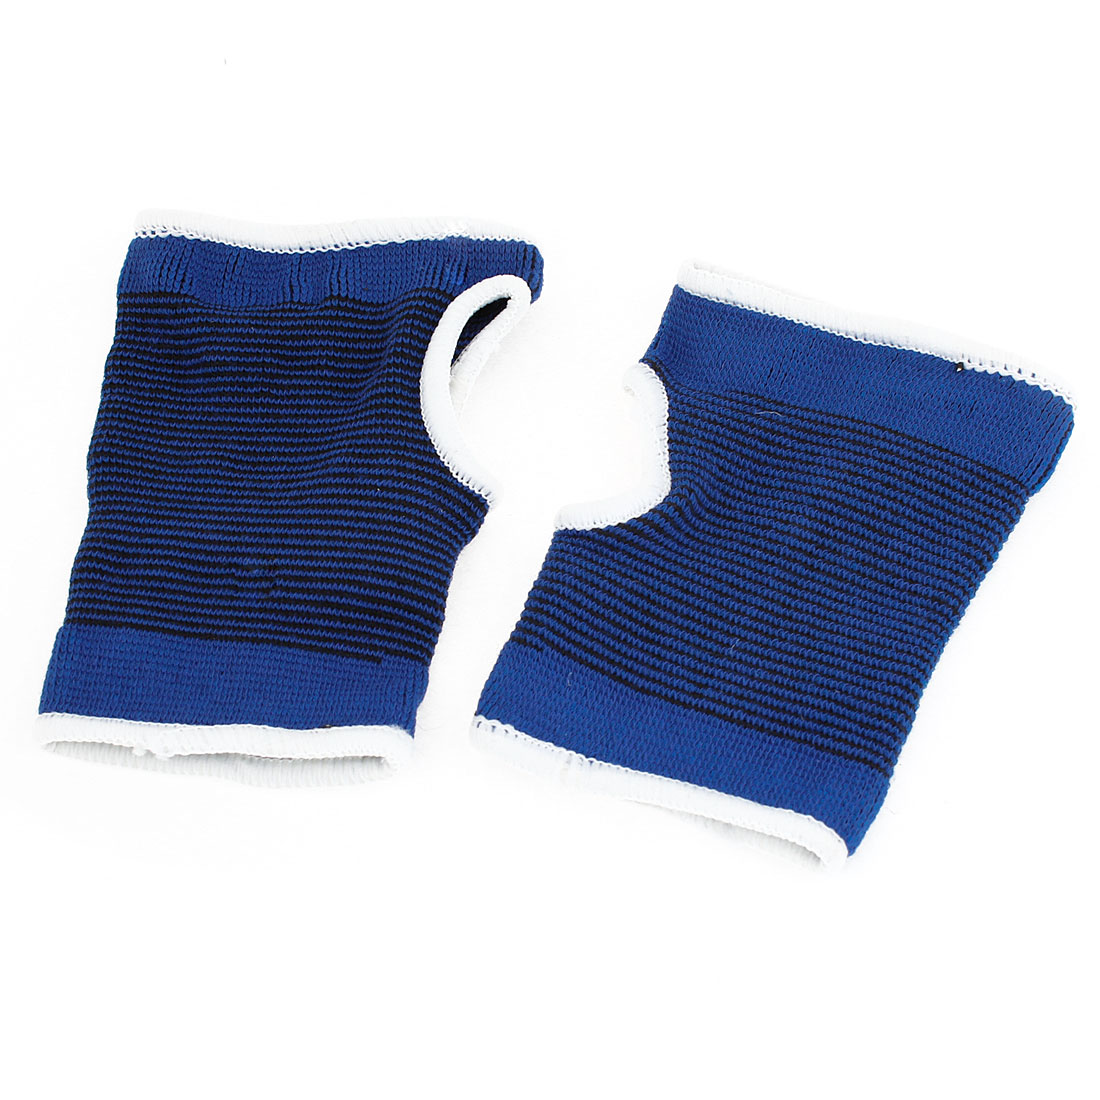 2 Pcs Thumbhole Design Black Blue Stripe Pattern Palm Wrist Support Protector